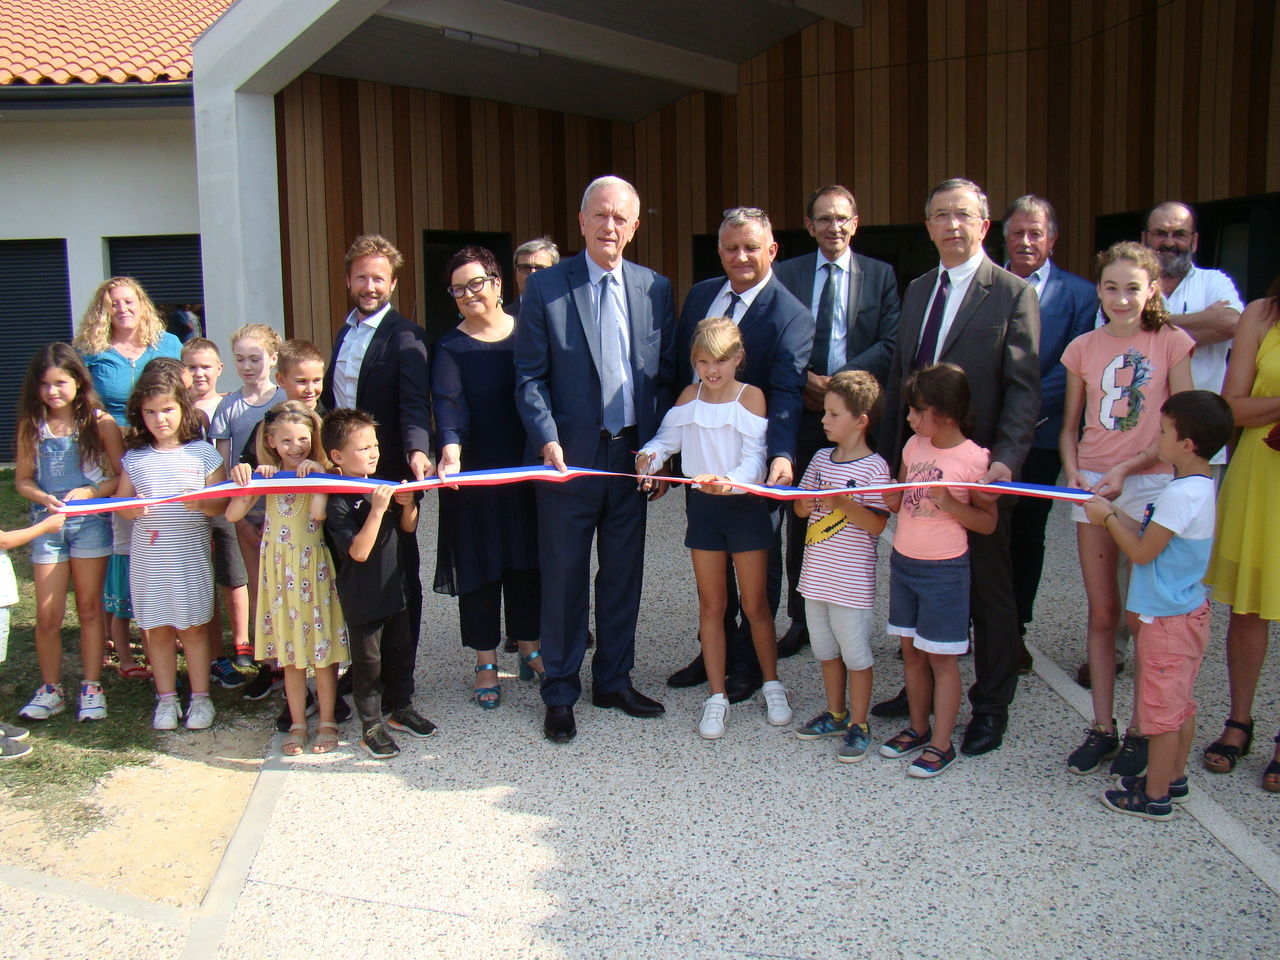 29-08-19-inauguration pôle enfance13.JPG